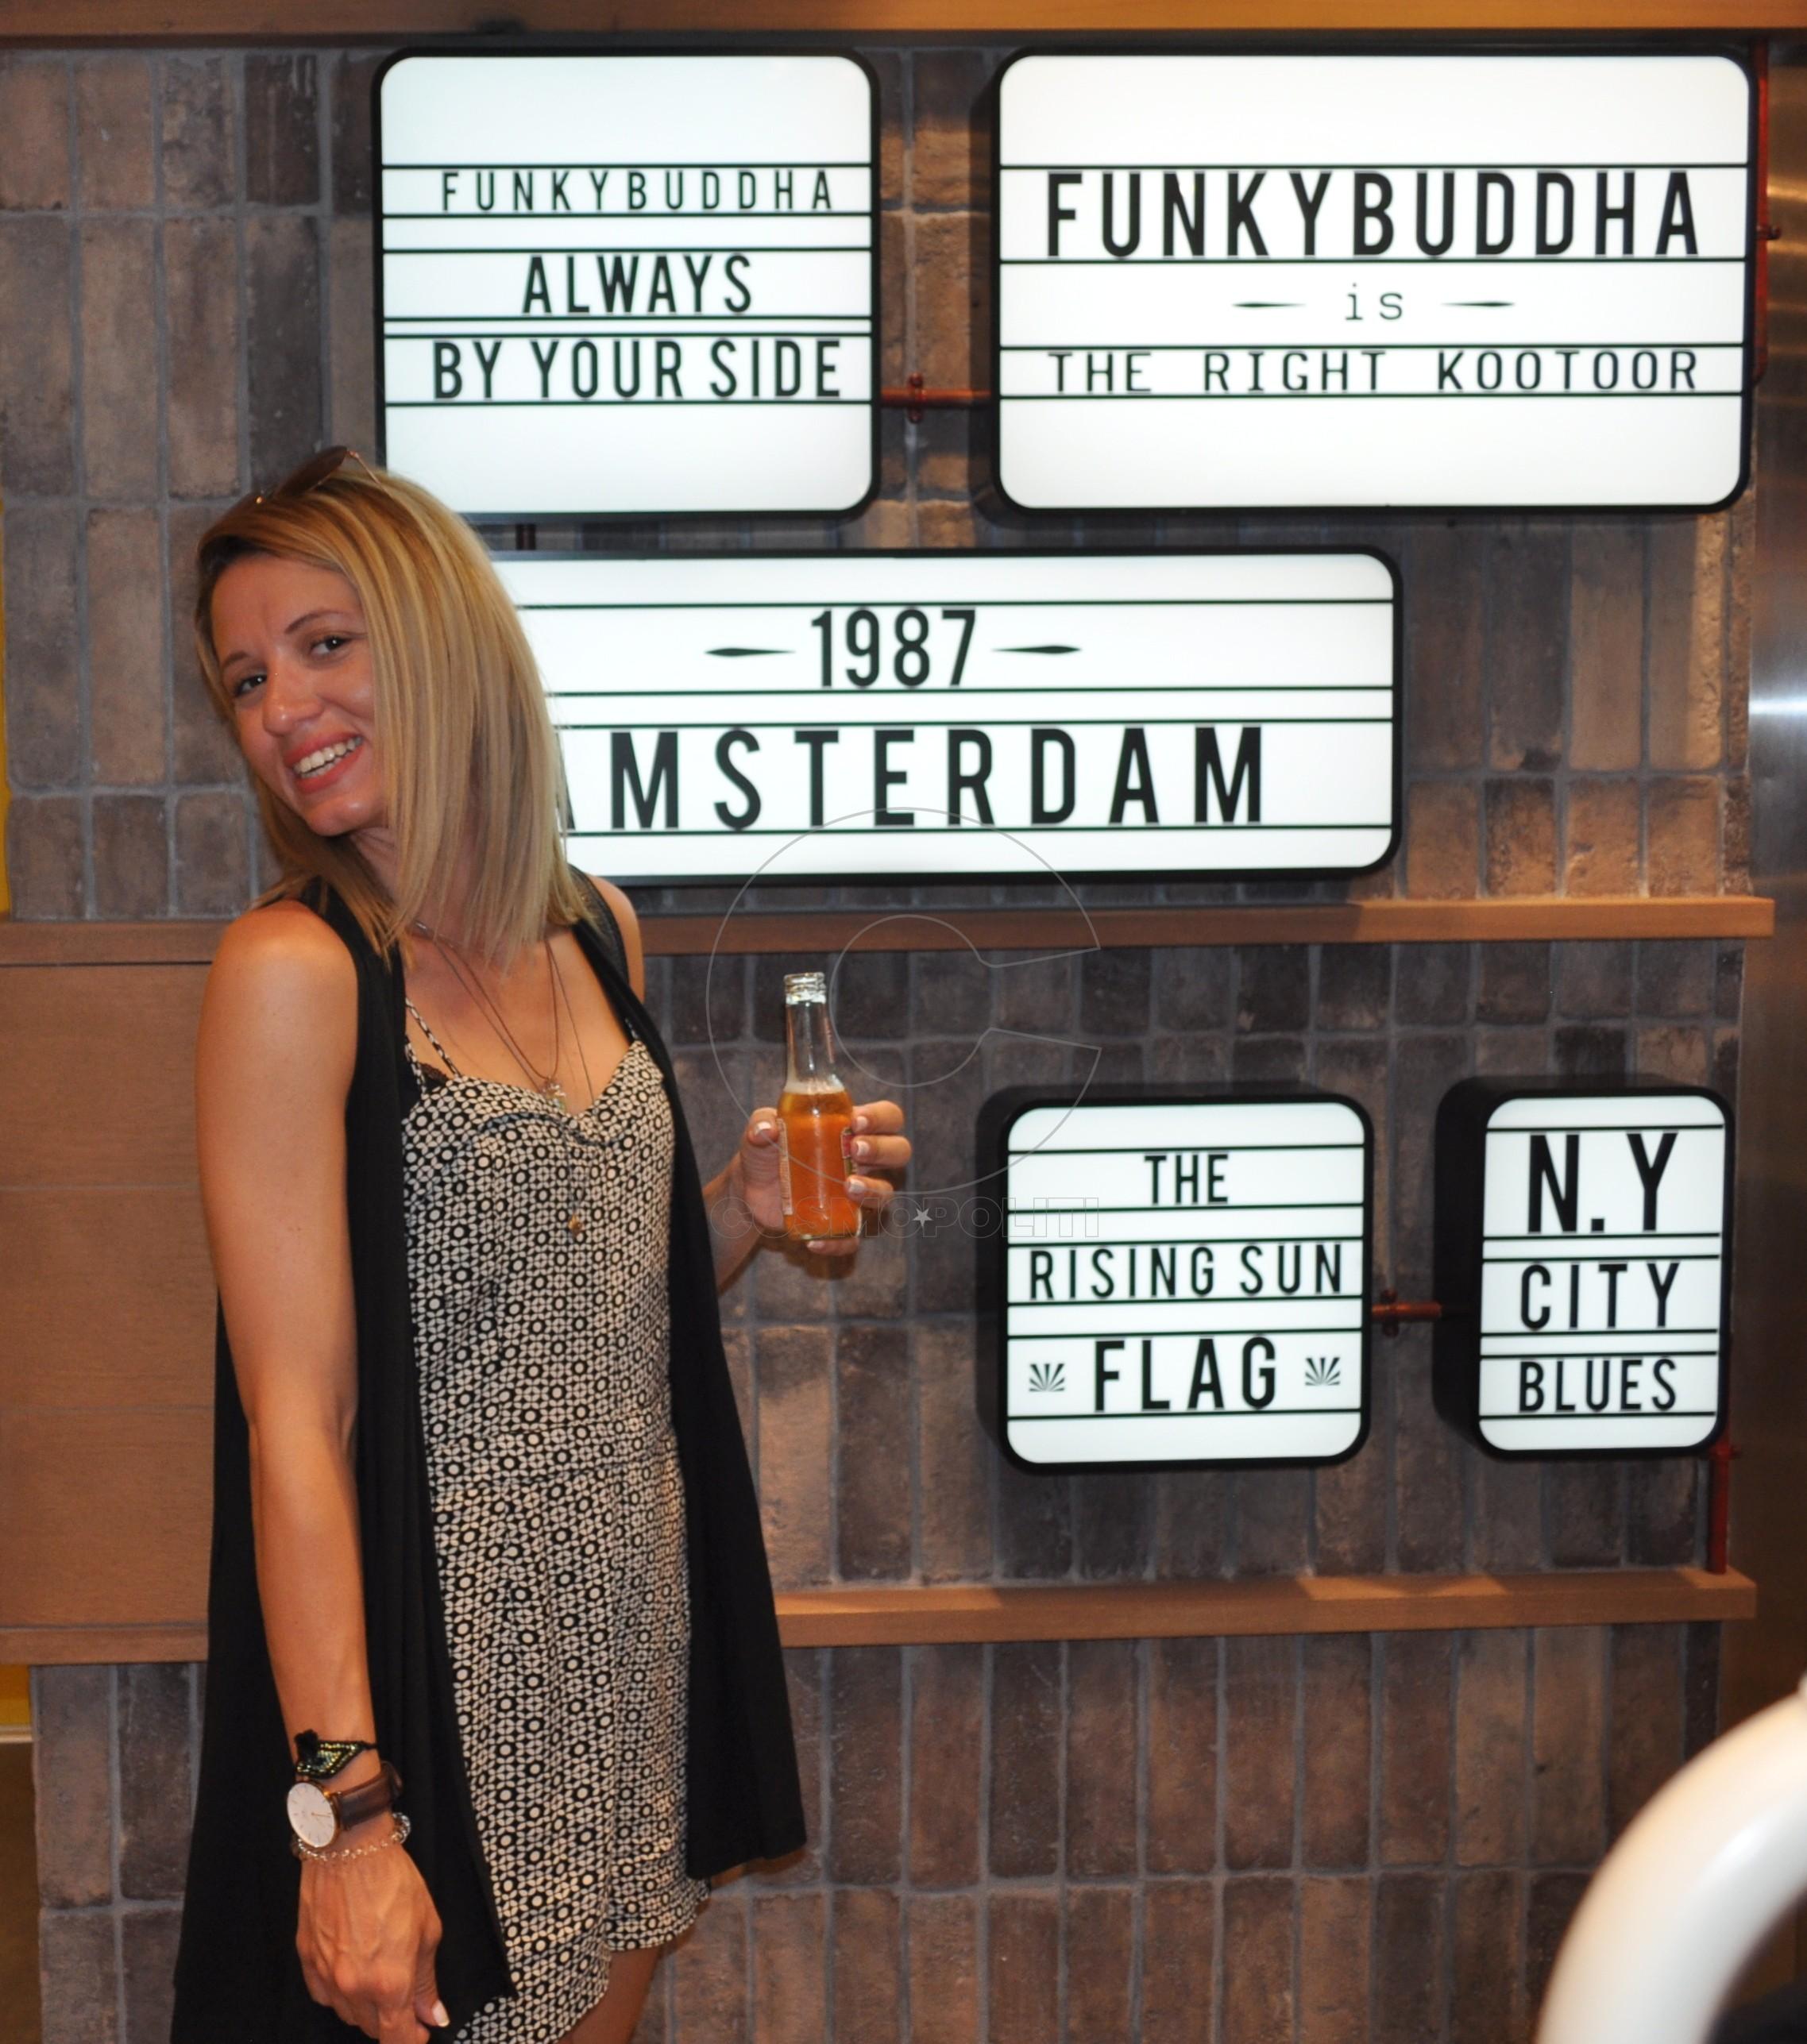 65fb5f109abb Στο νέο κατάστημα της Funky Buddha στην Ερμού - Cosmopoliti.com ...